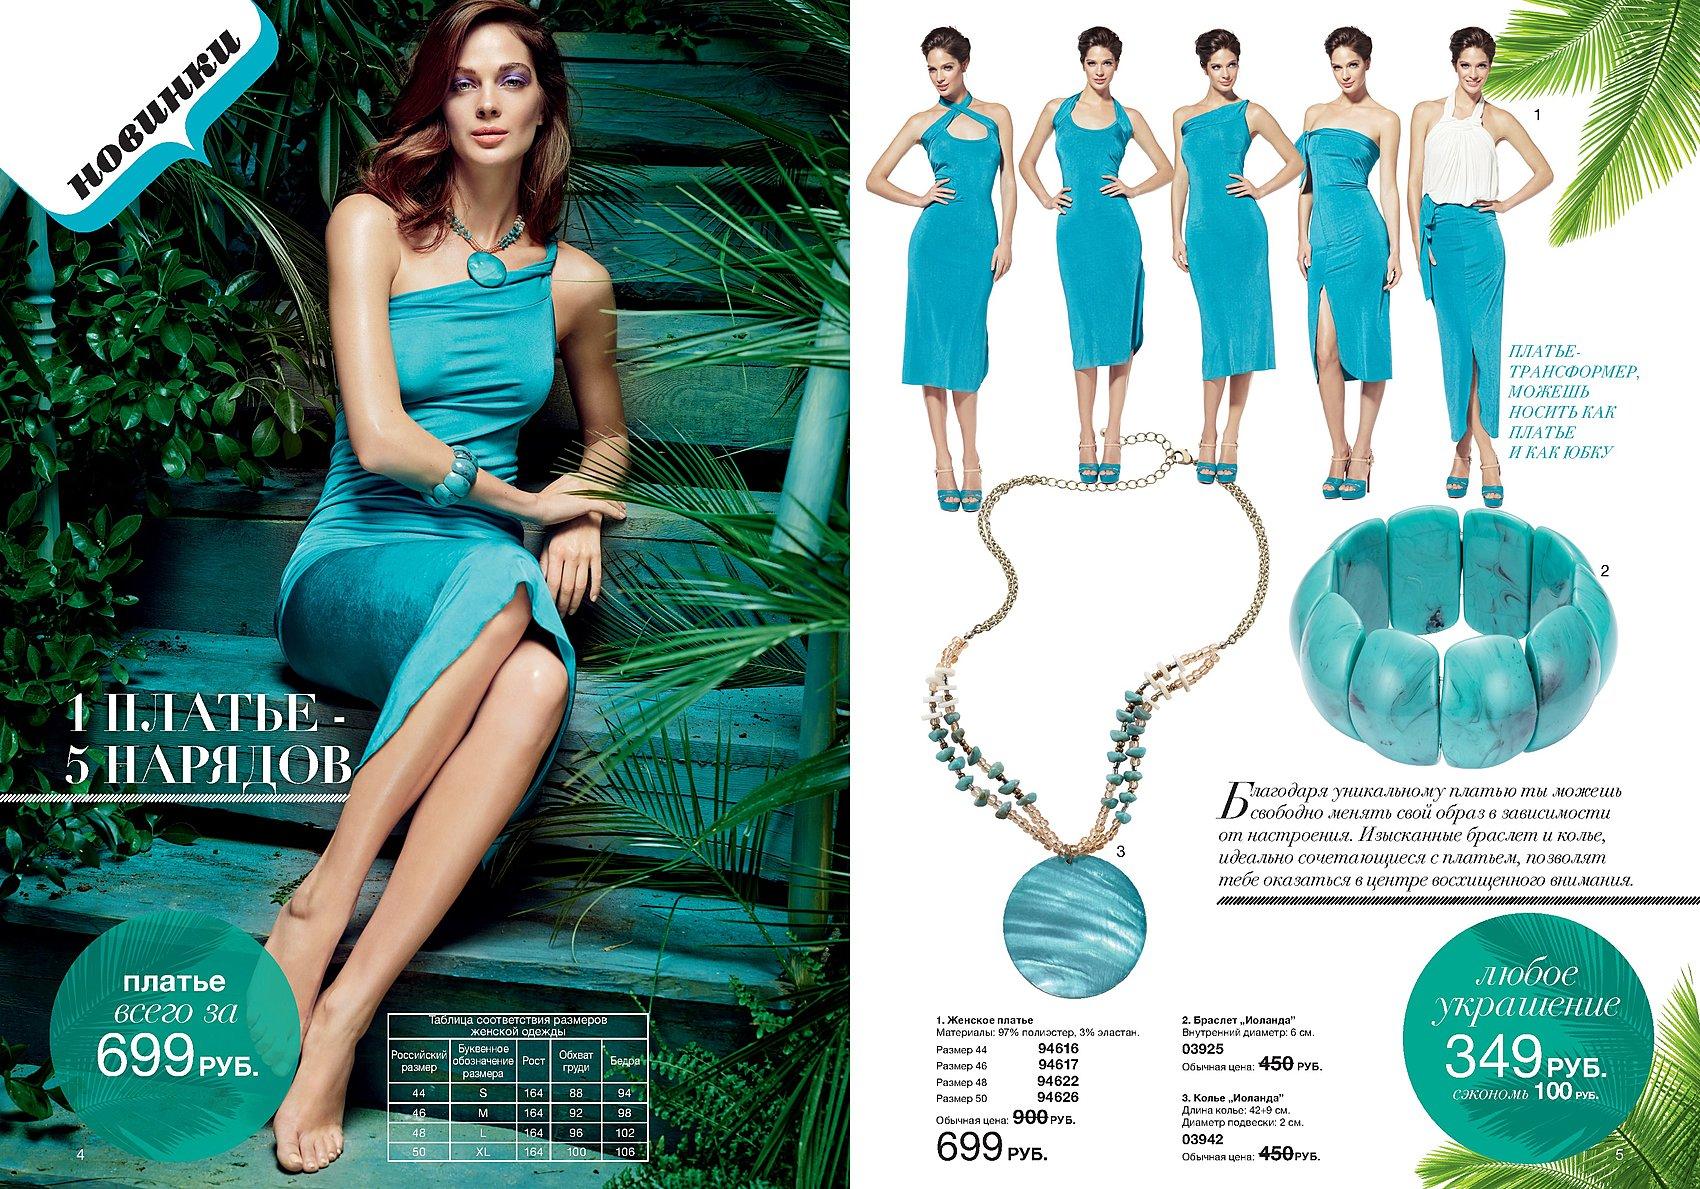 Женская Одежда Фирма Avona